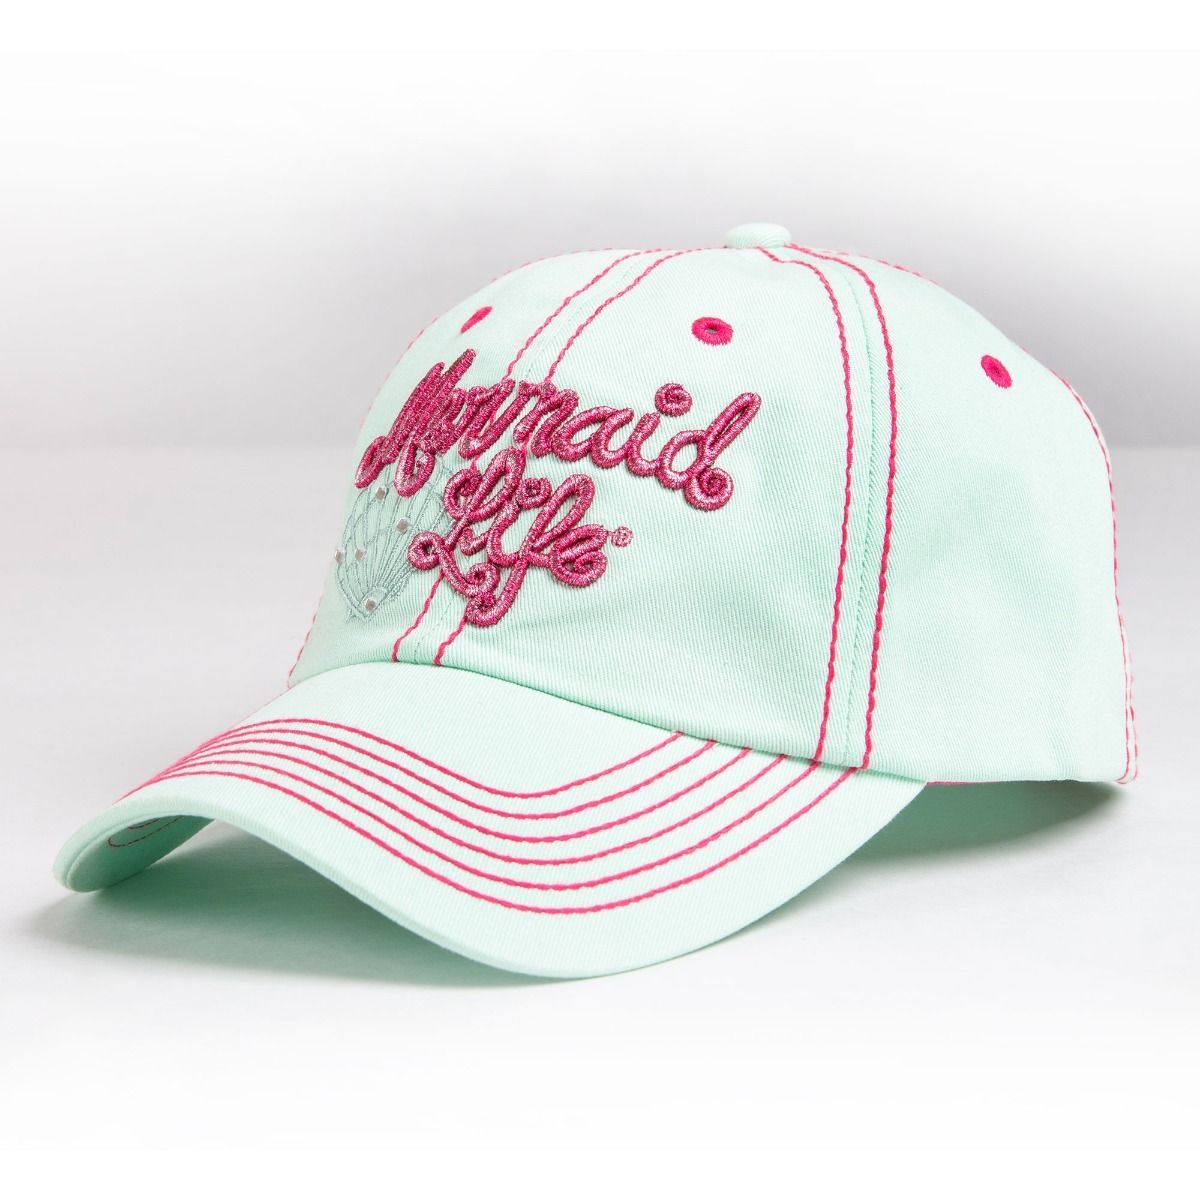 0be21aa23 Mermaid Life® Shimmer & Shell Cap: Mint